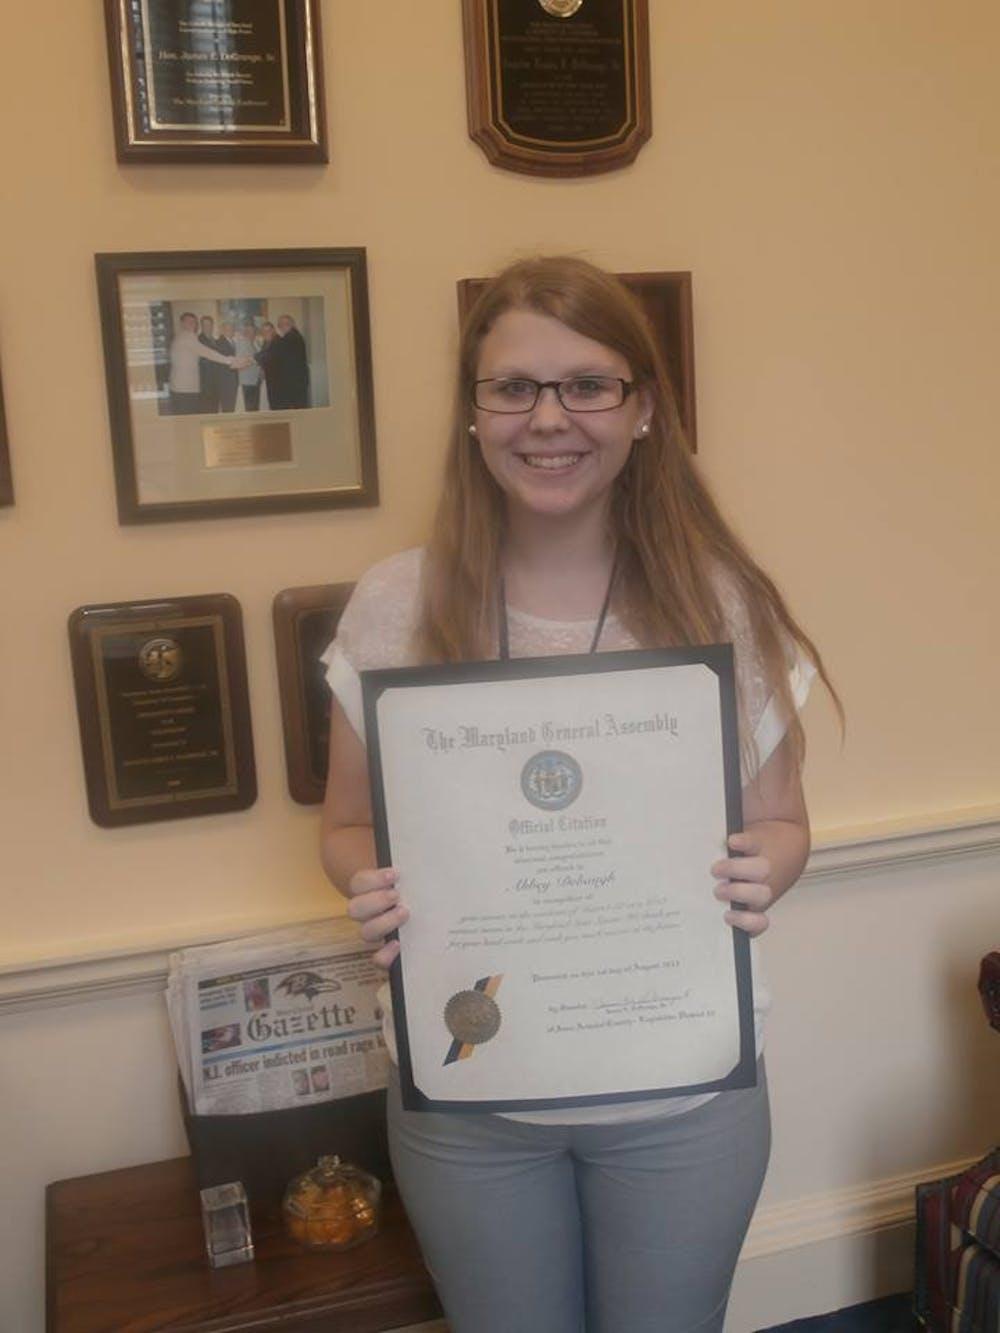 Student Spotlight: Abbey Debaugh active in community